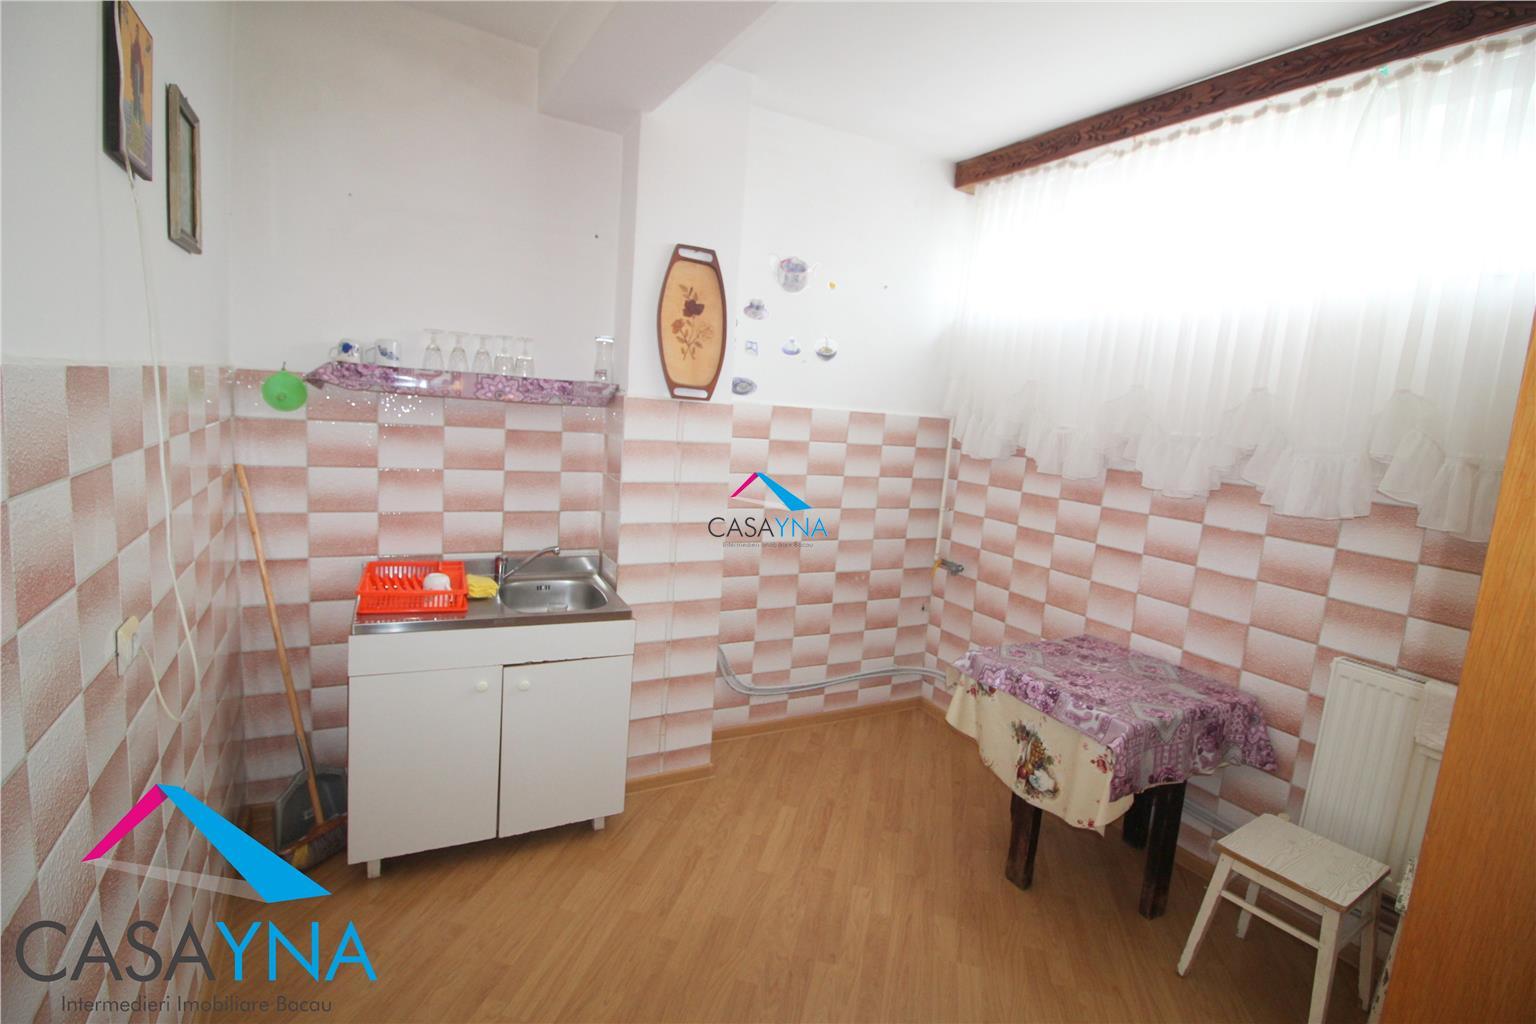 Garsoniera confort I, 60 mp utilI, zona Piata Mioritei, bloc '85